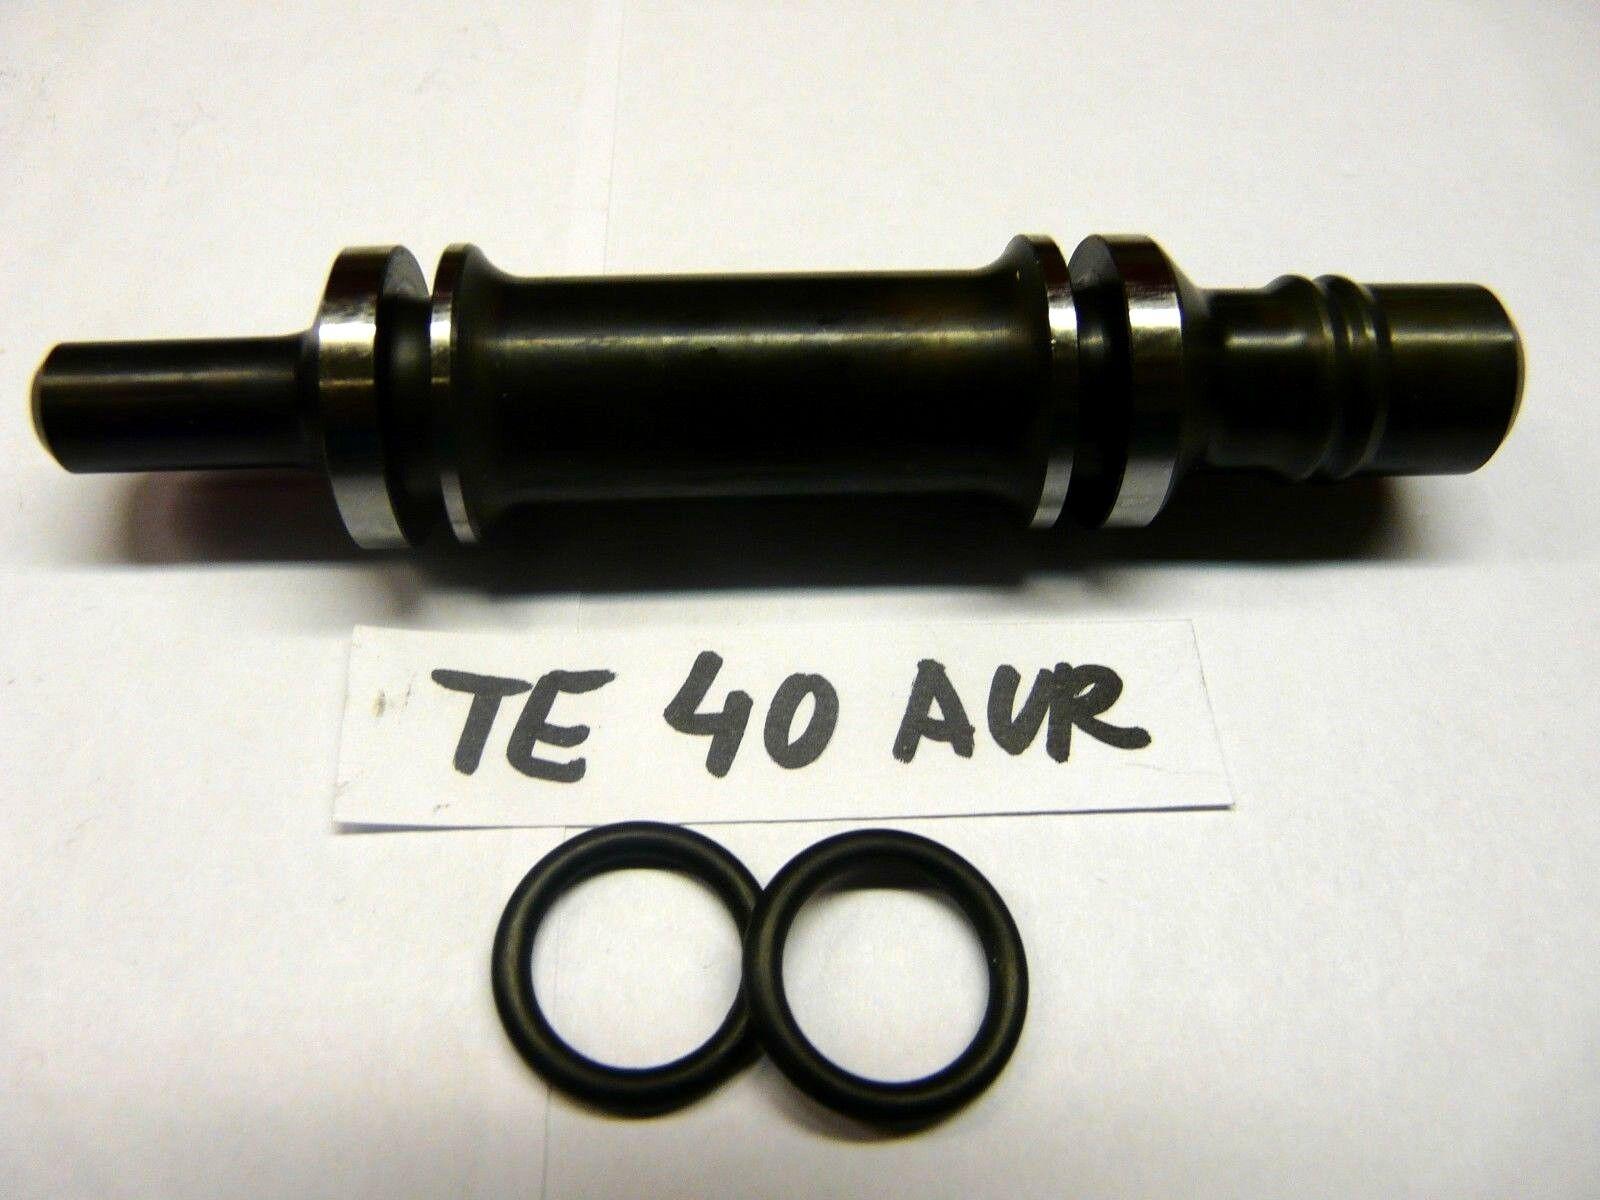 Hilti TE 40 AVR, Döpper       (38823.22)